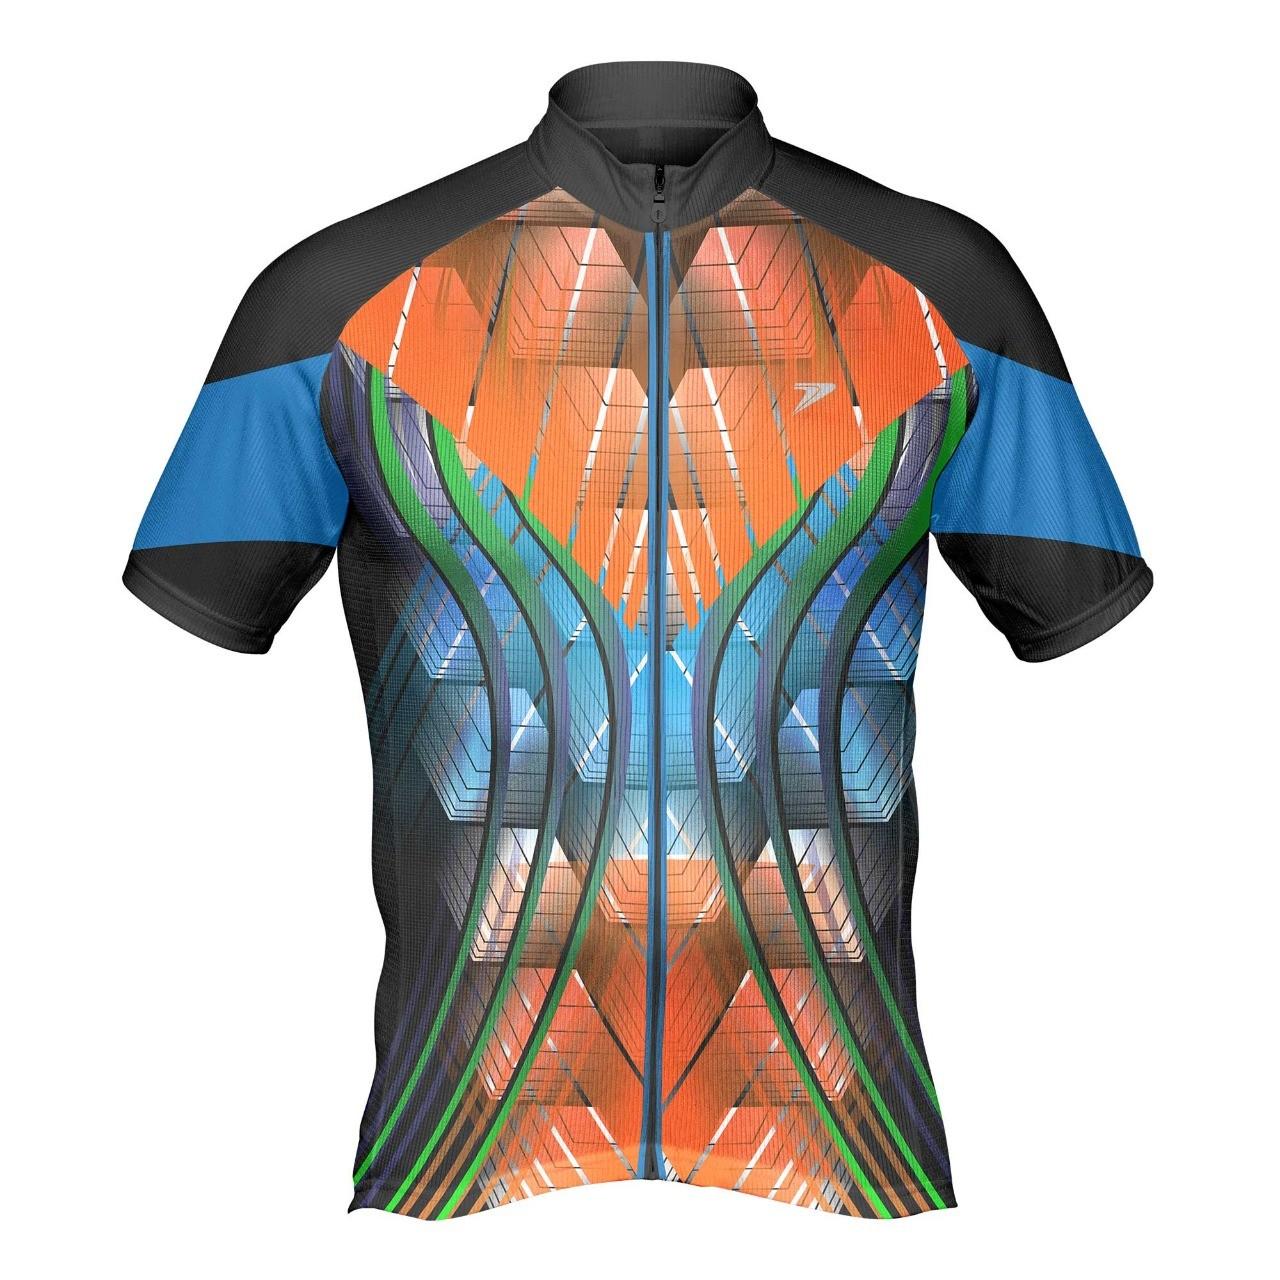 Camisa ciclista c/ zíper total Rush laranja - Poker